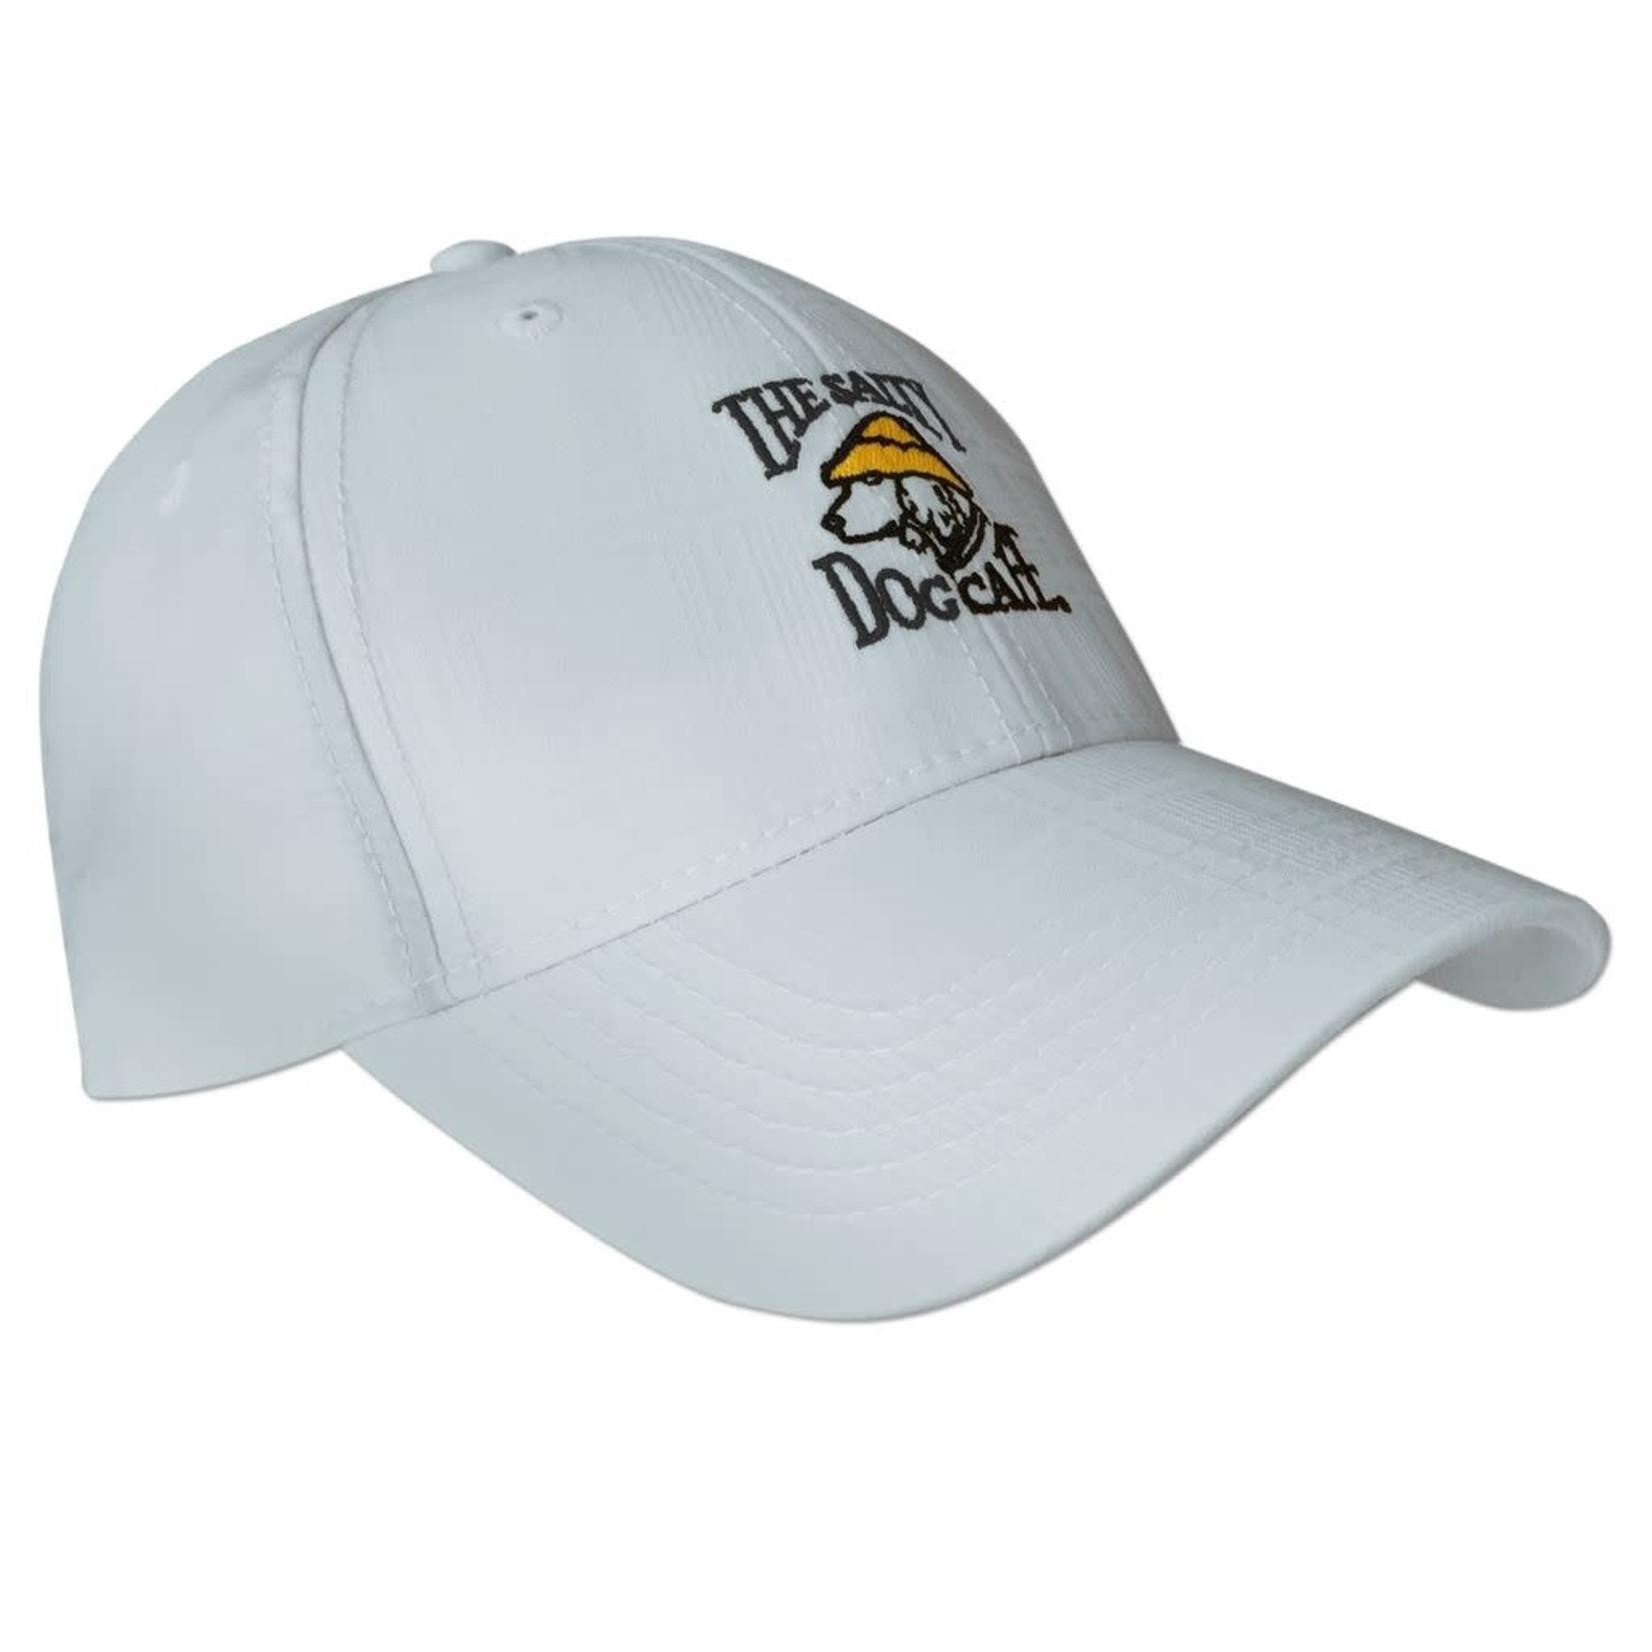 Hat - Plaid Tech, White, OSFA